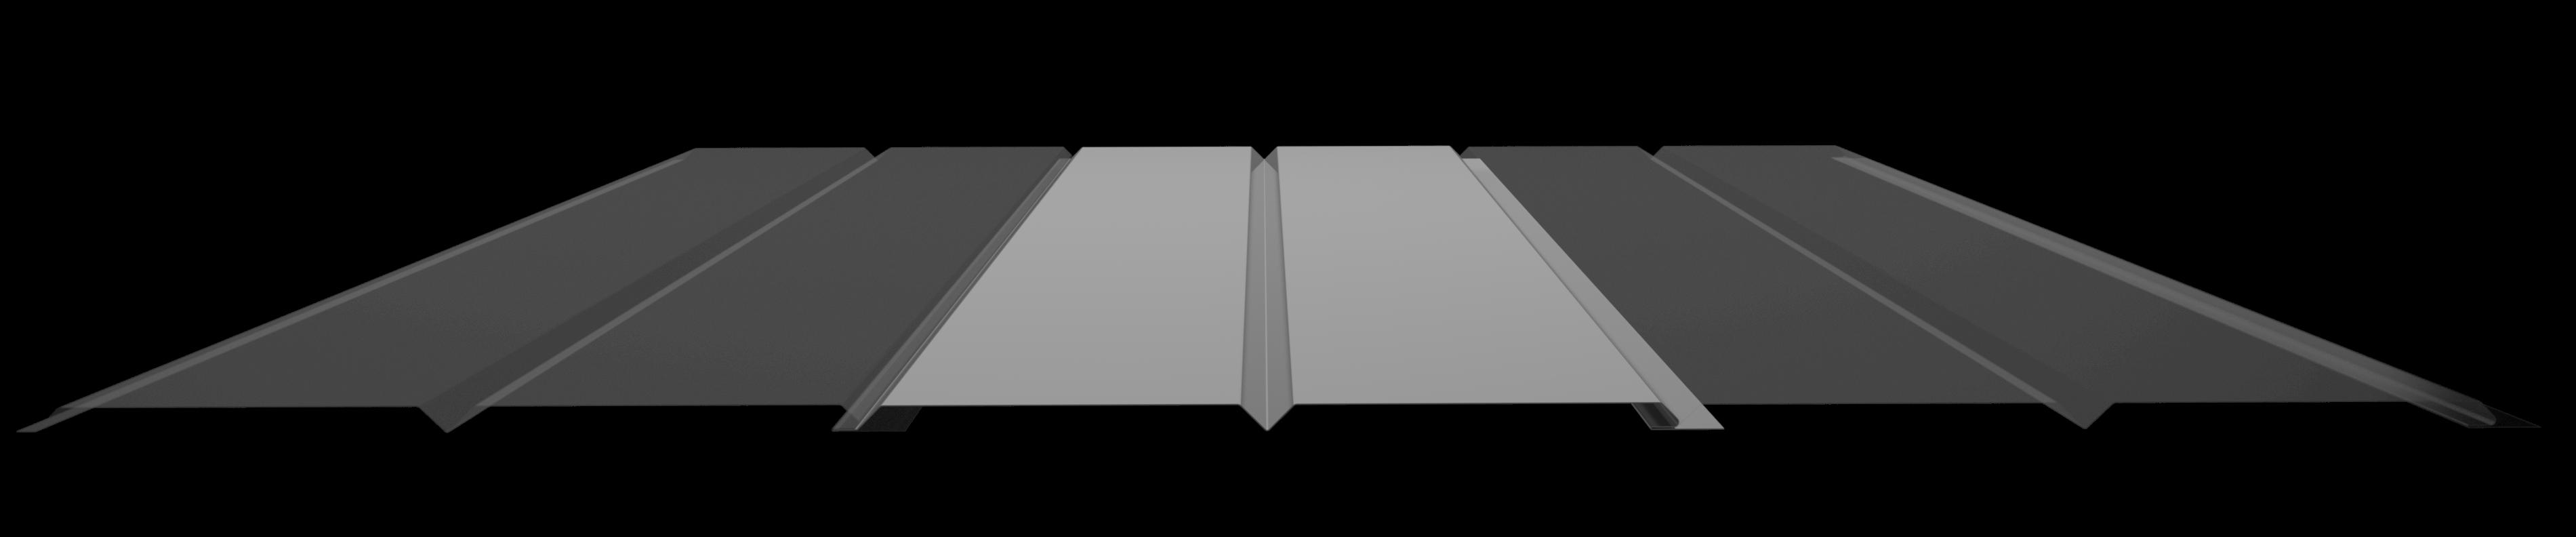 V Soffit Panel System Steel Soffit For Residential And